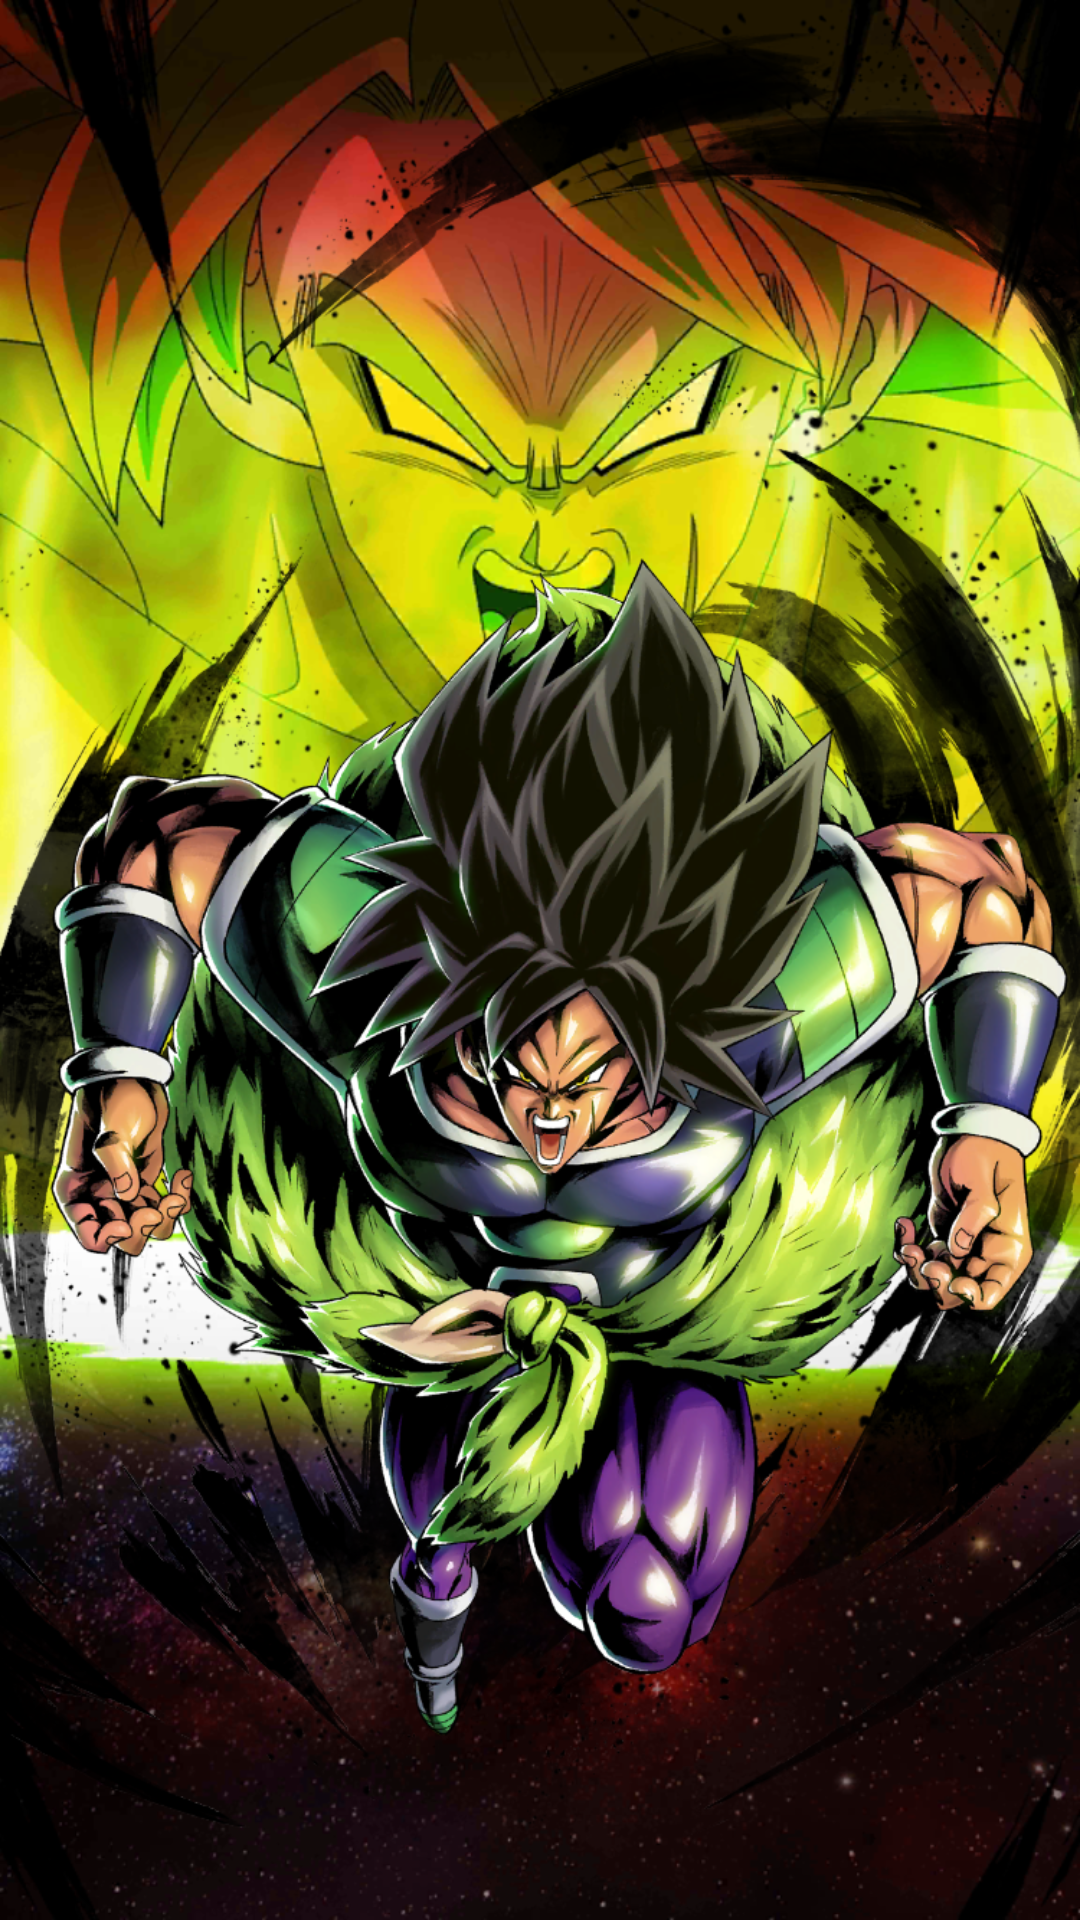 Broly: Fury (SP) (RED) | Dragon Ball Legends Wiki | Fandom